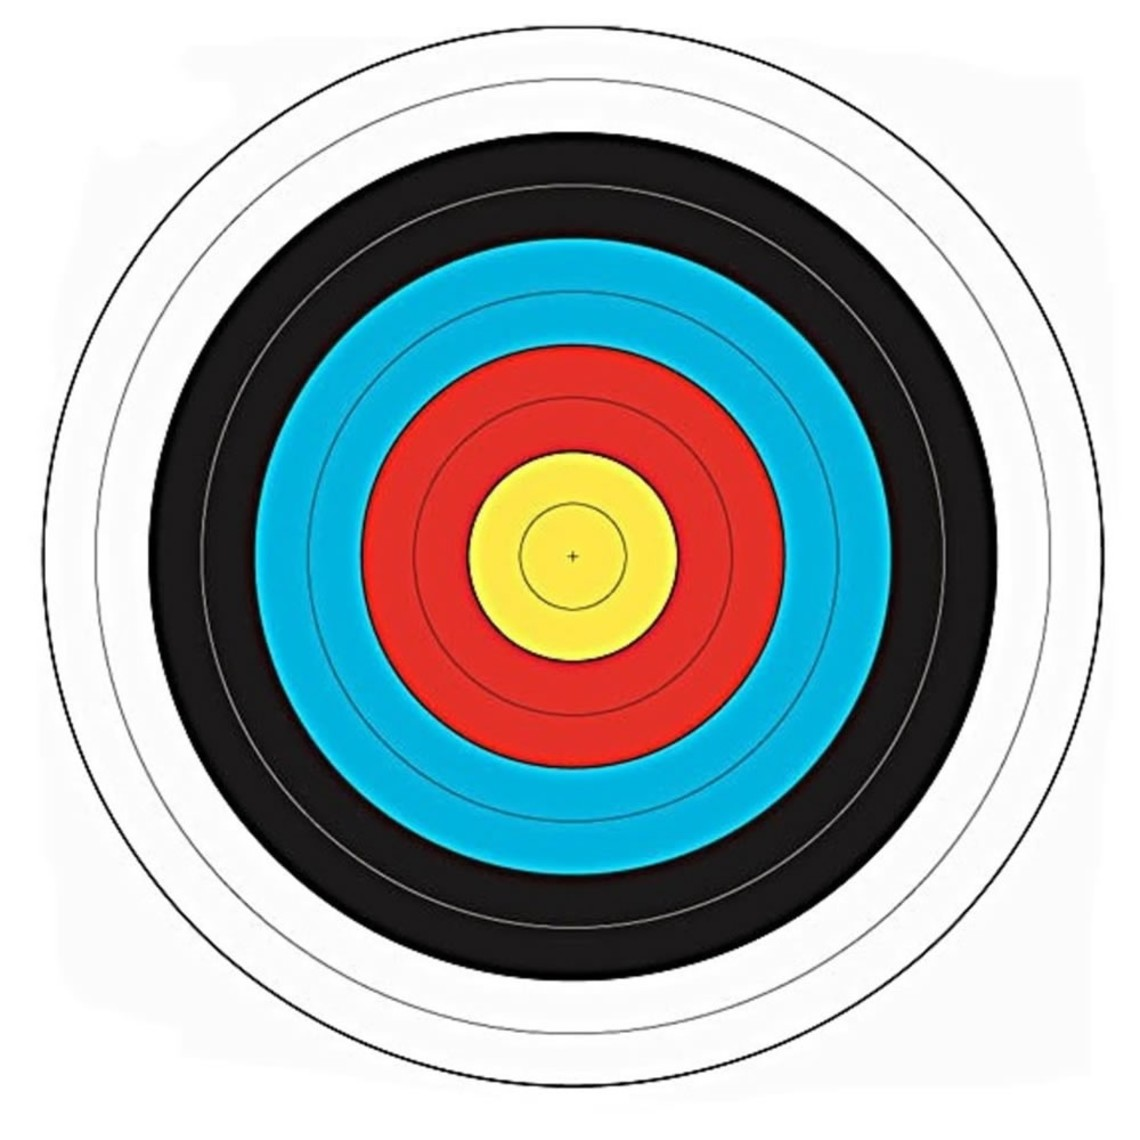 Paper target 40 x 40 cm